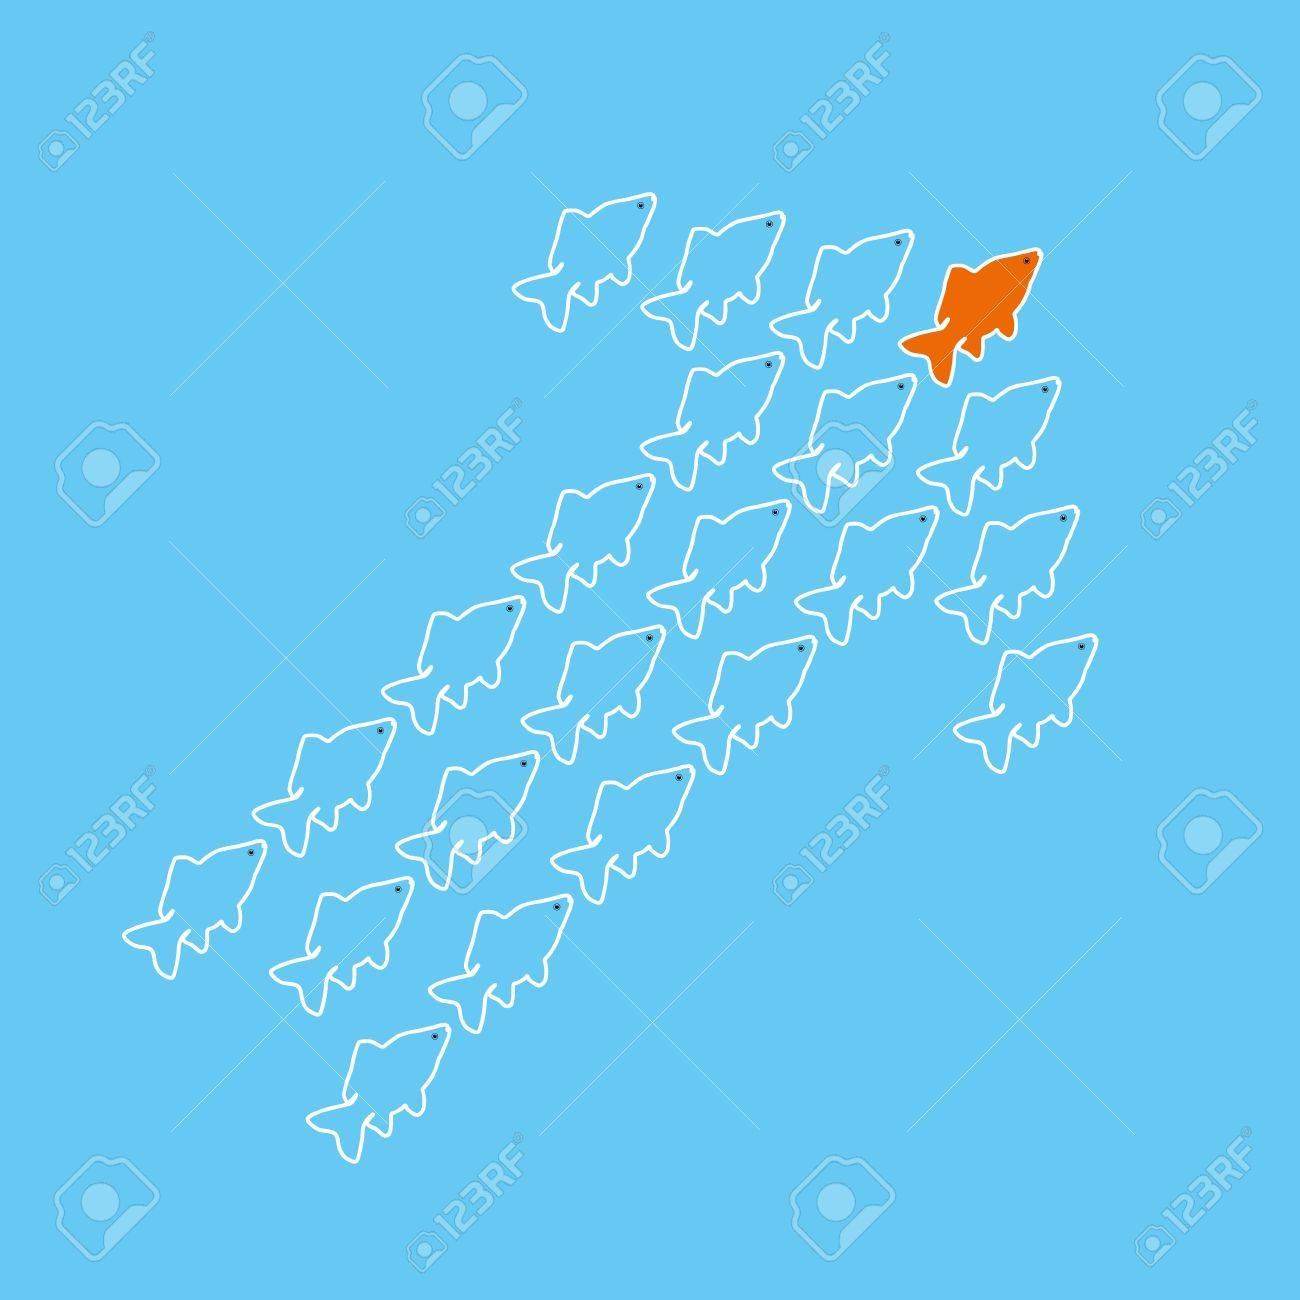 clip art illustration of goldfish forming an arrow Stock Vector - 17286140